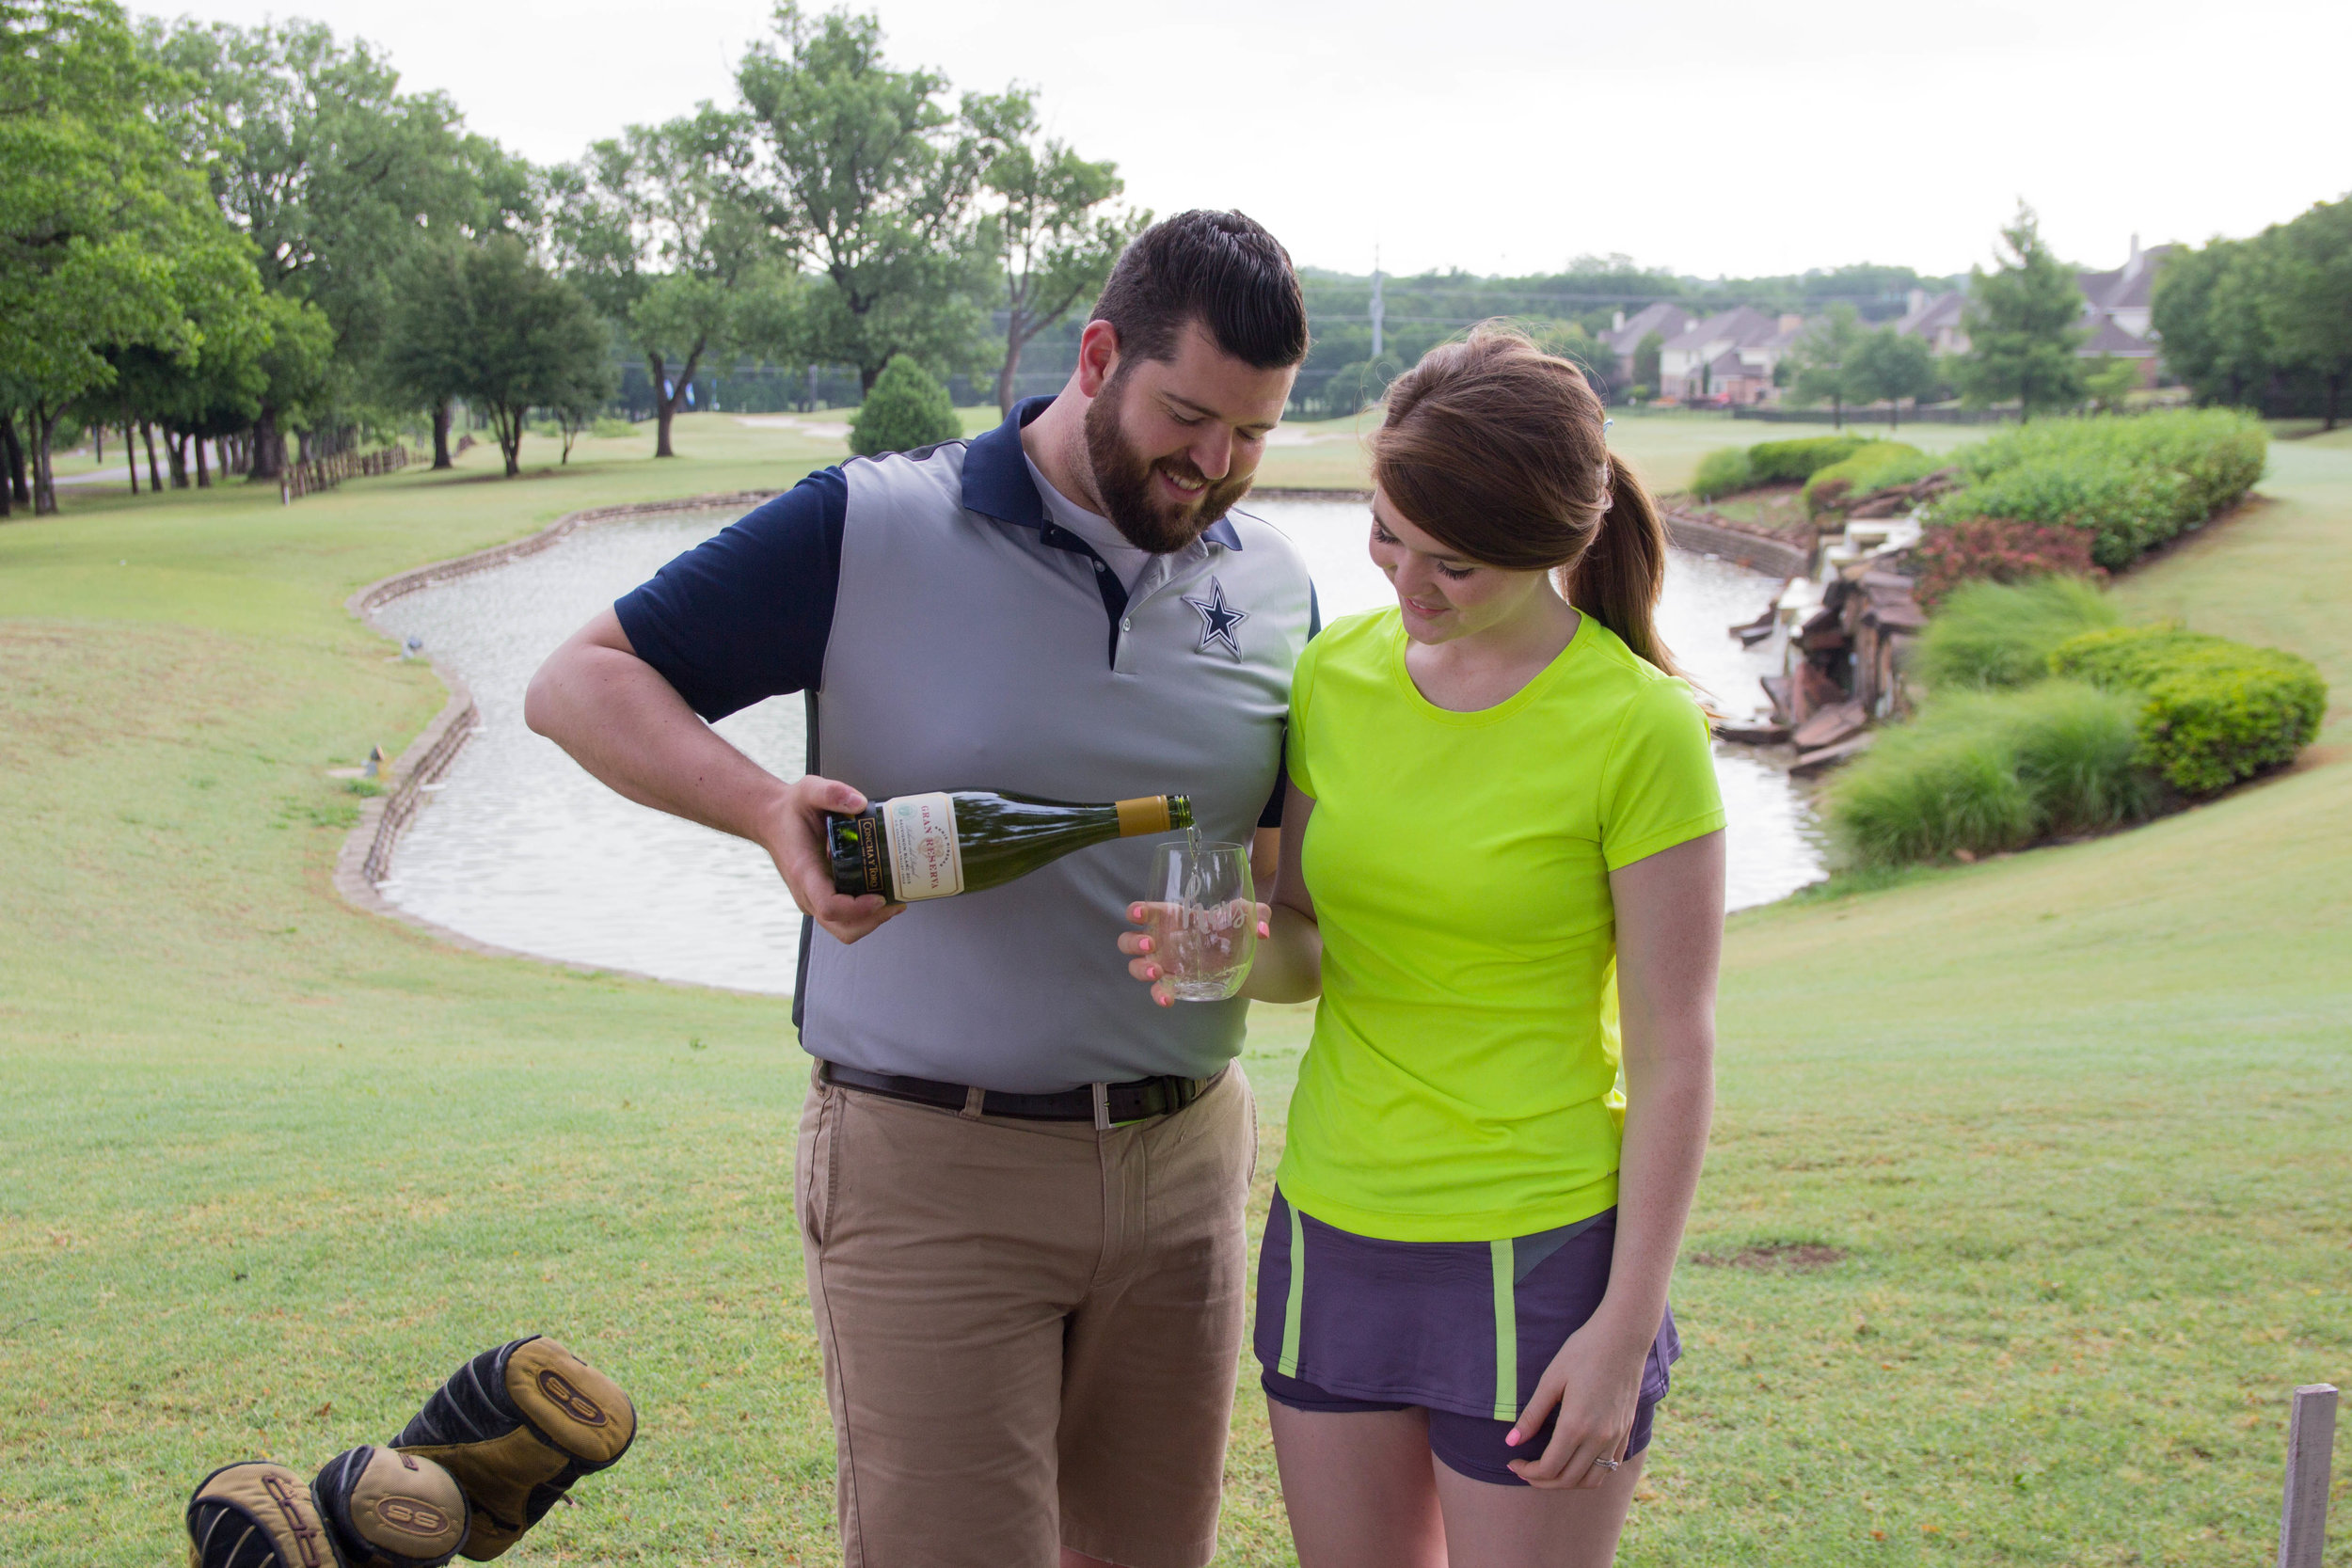 concha y toro gran reserva wine, golfweek, nike, air max thea, firewheel golf course, kate spade his and her wine glasses, cobras golf clubs